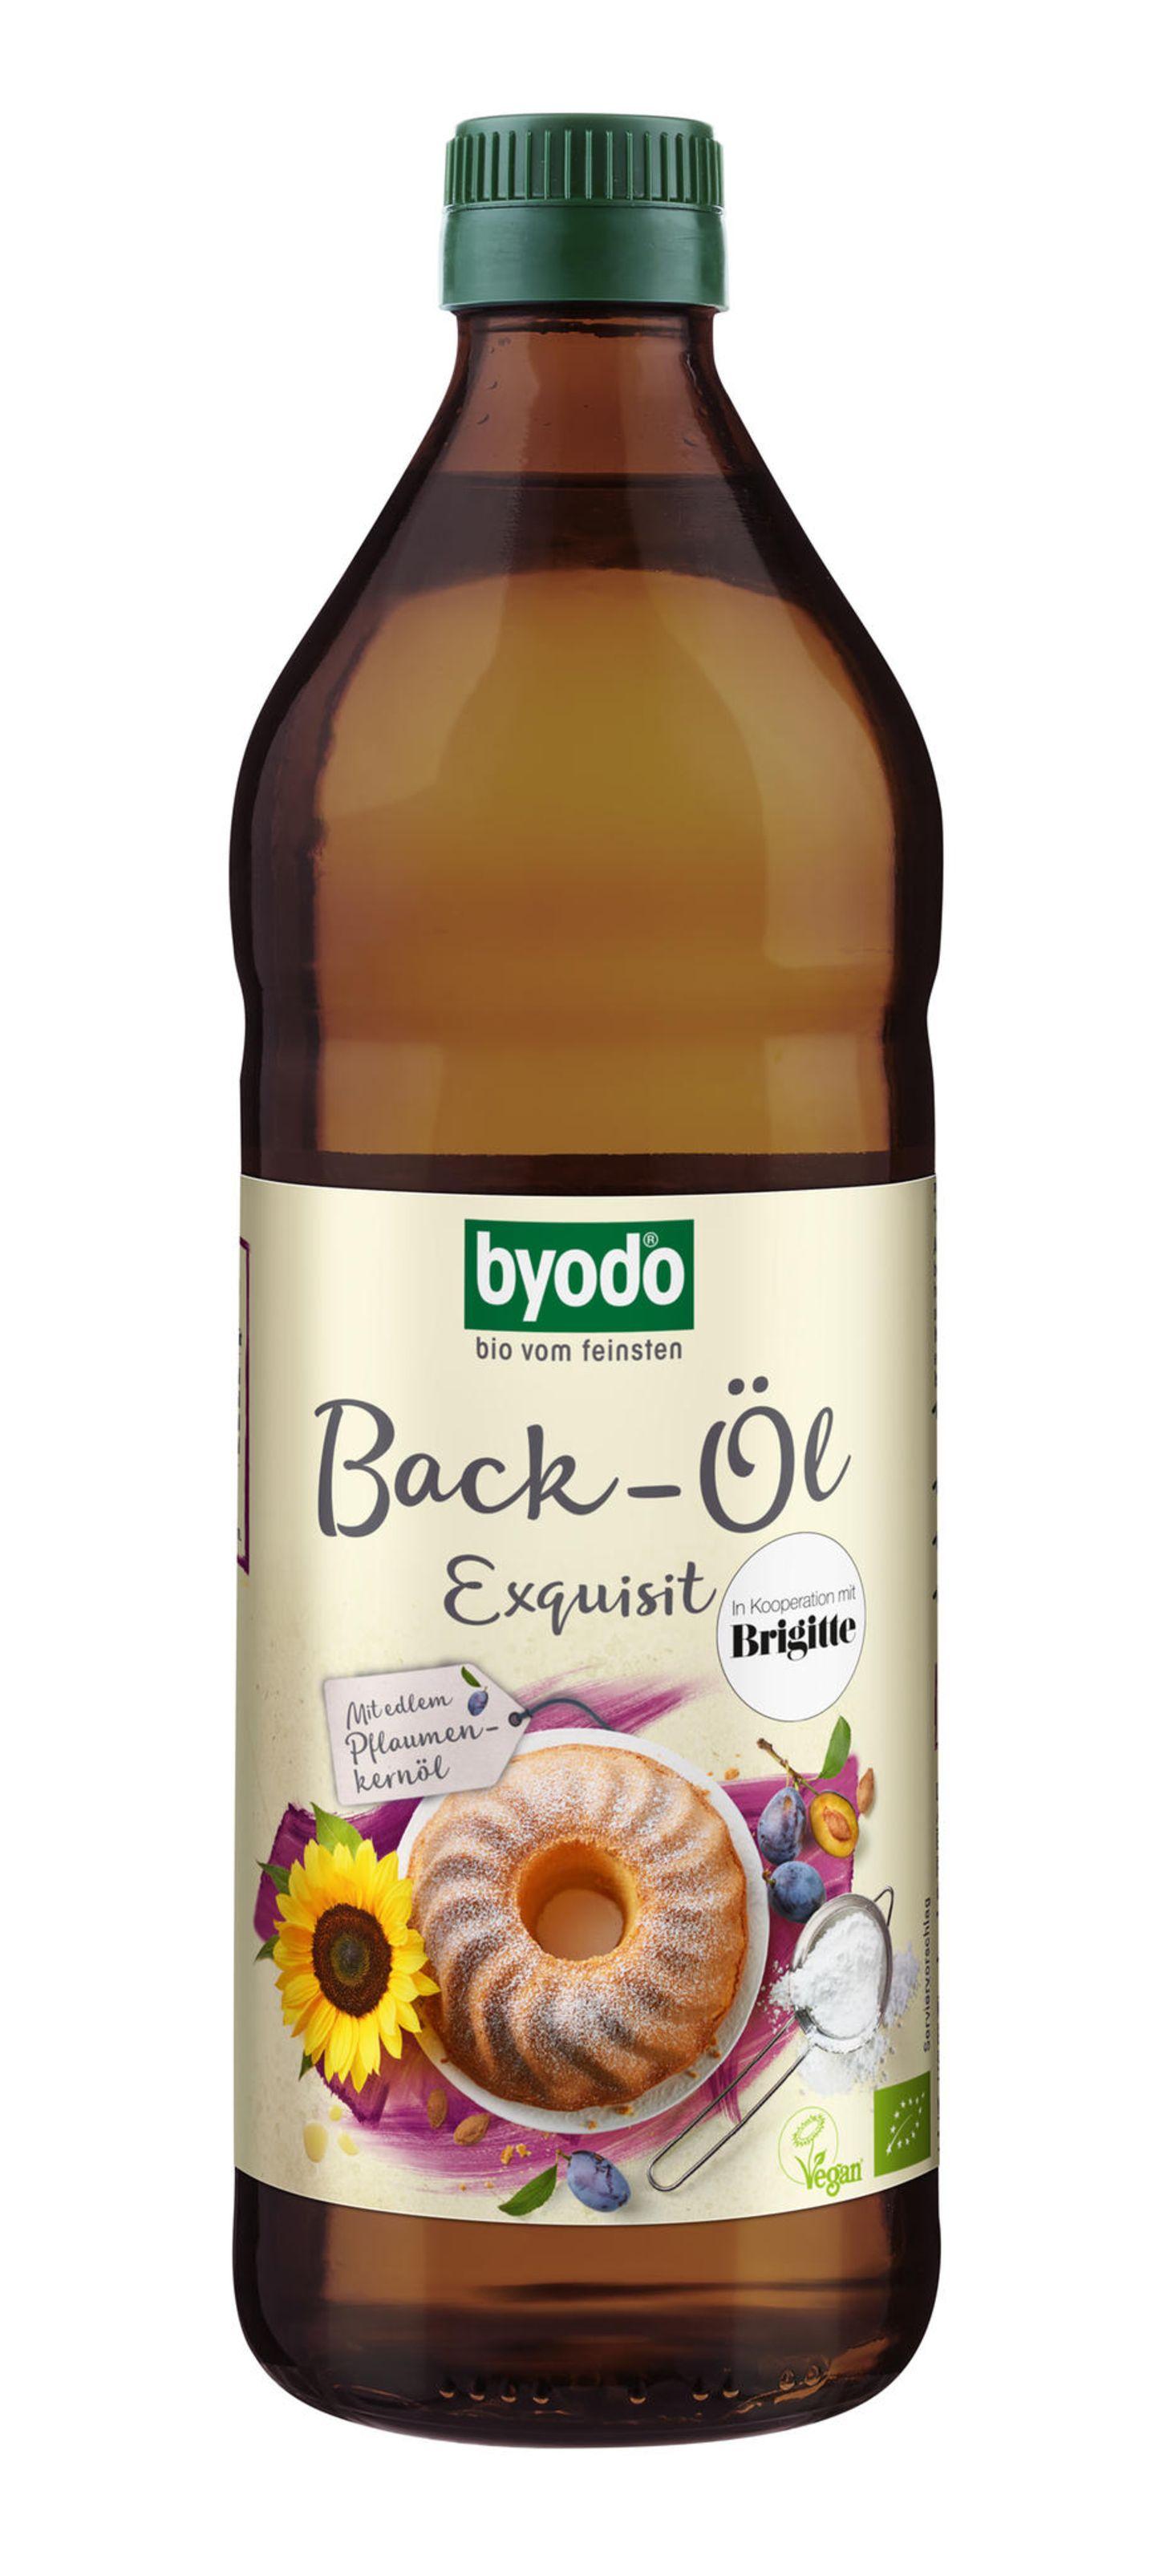 Food News: Byodo Back-Öl Exquisit